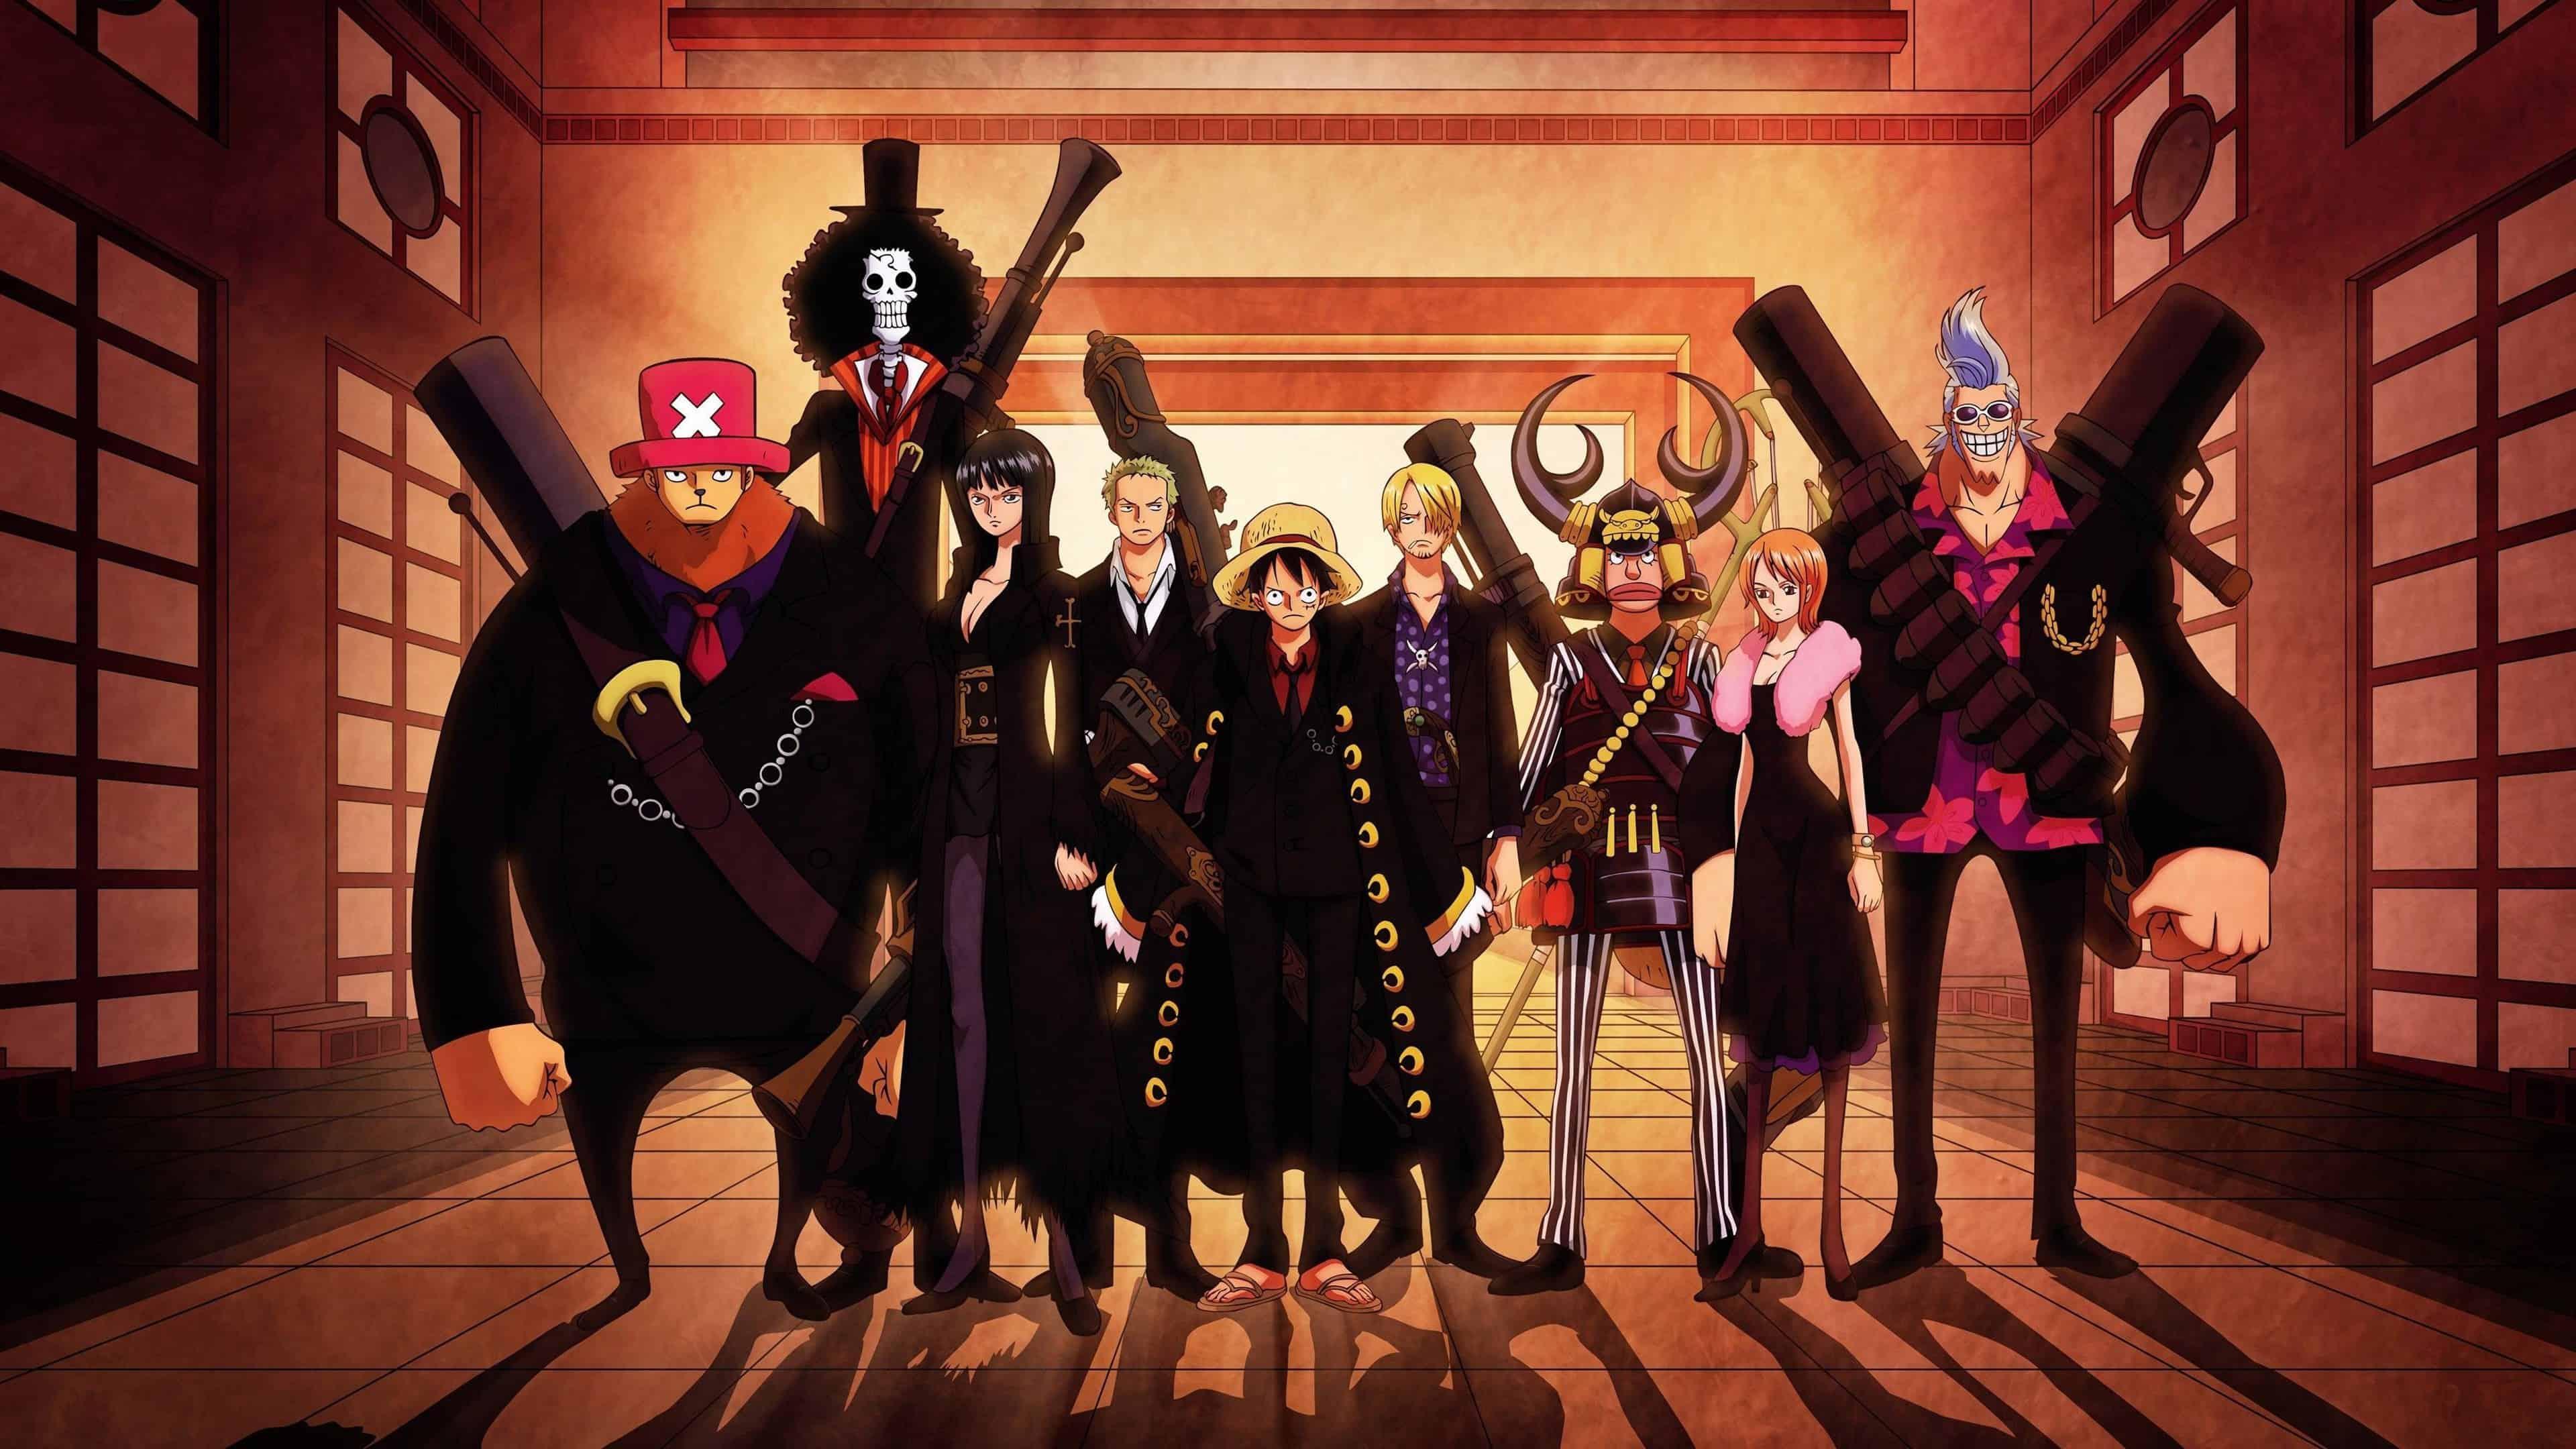 One Piece Film Strong World Uhd 4k Wallpaper Pixelz